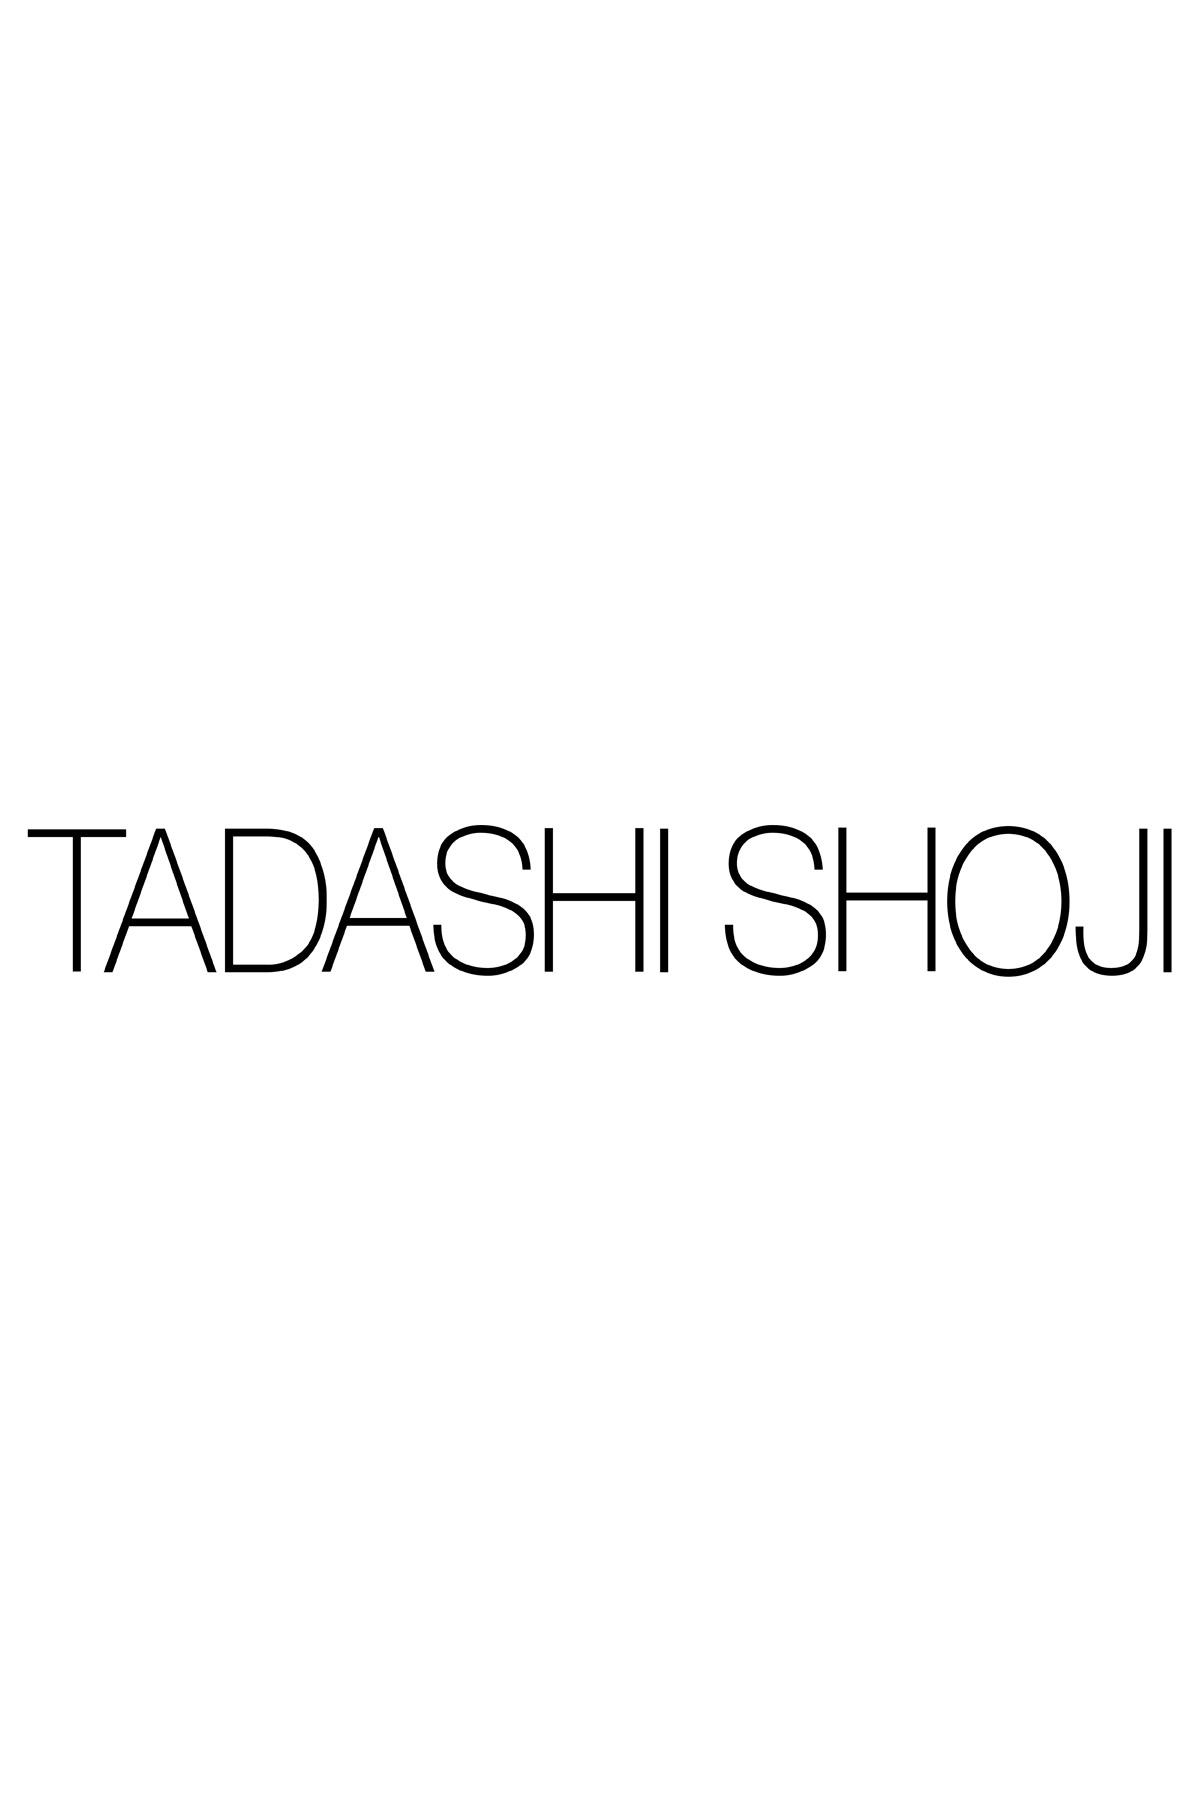 Tadashi Shoji x Bel Aire Bridal - Delicate Comb with Petite Flowers